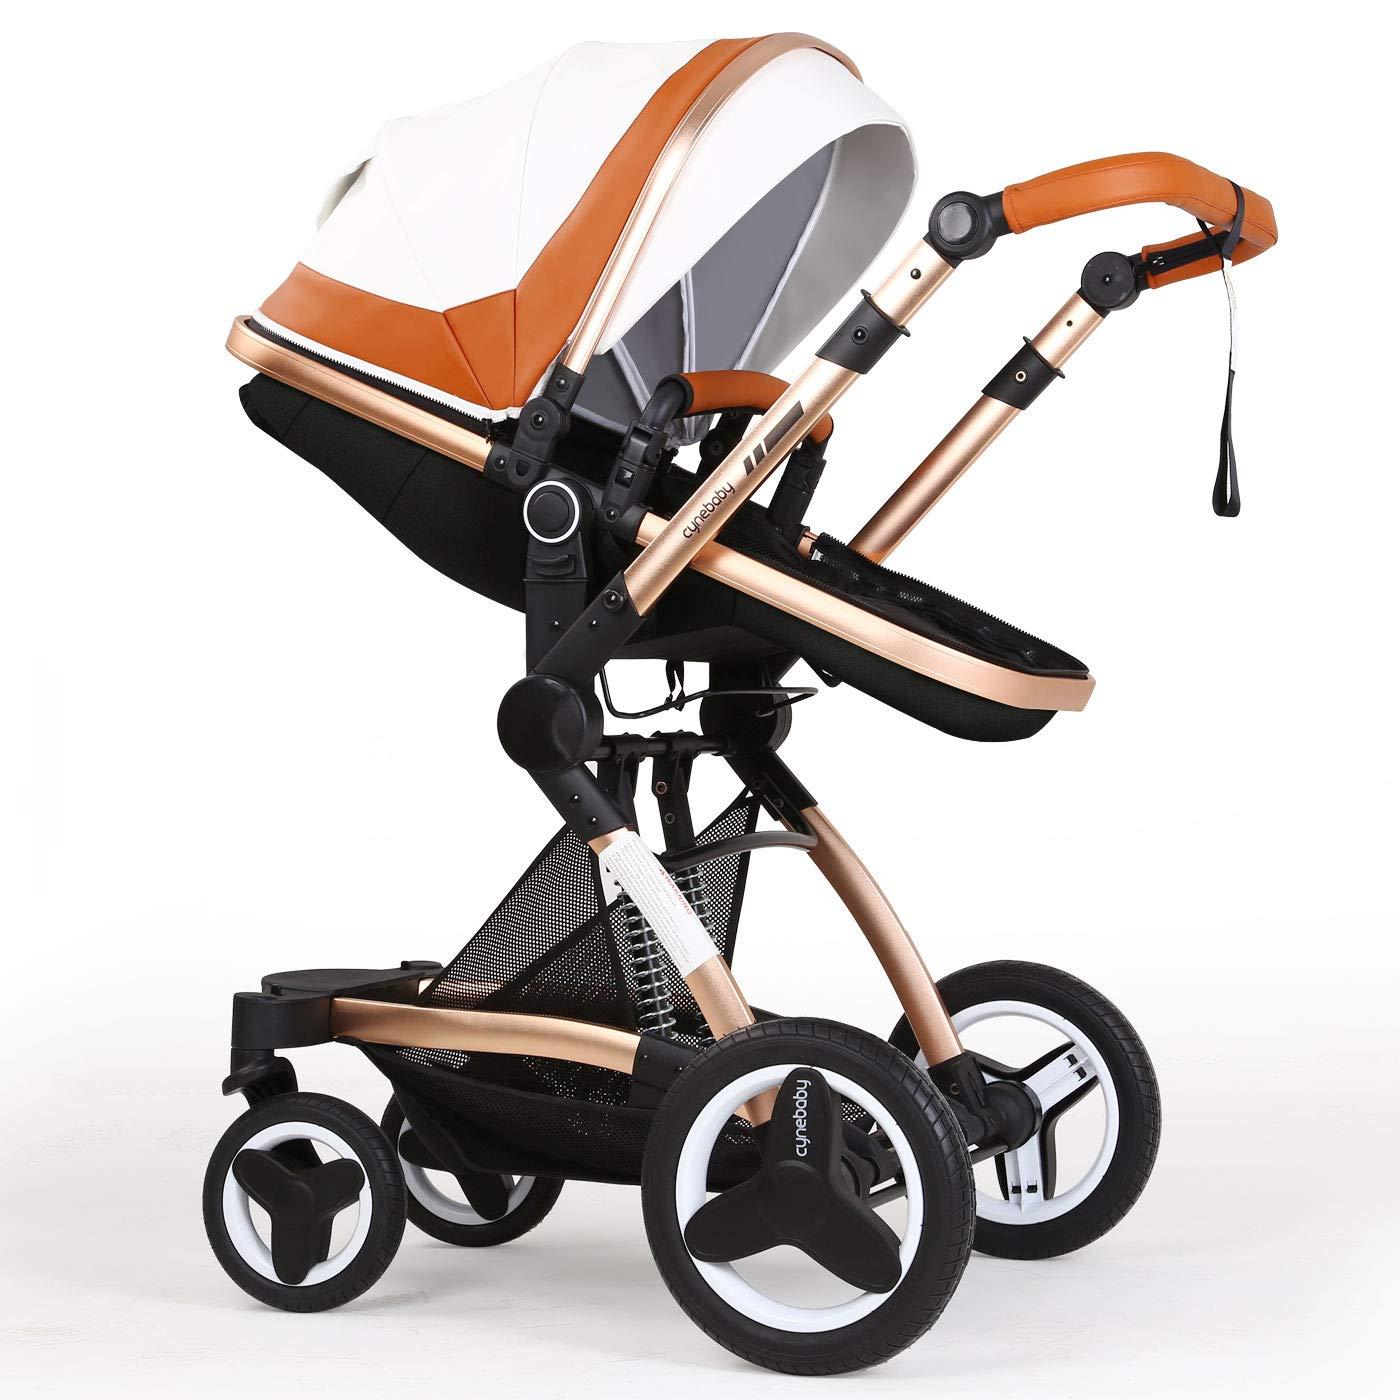 Newborn Baby Pushchair Foldable Toddler Baby Stroller Pram Multifunctional Buggy